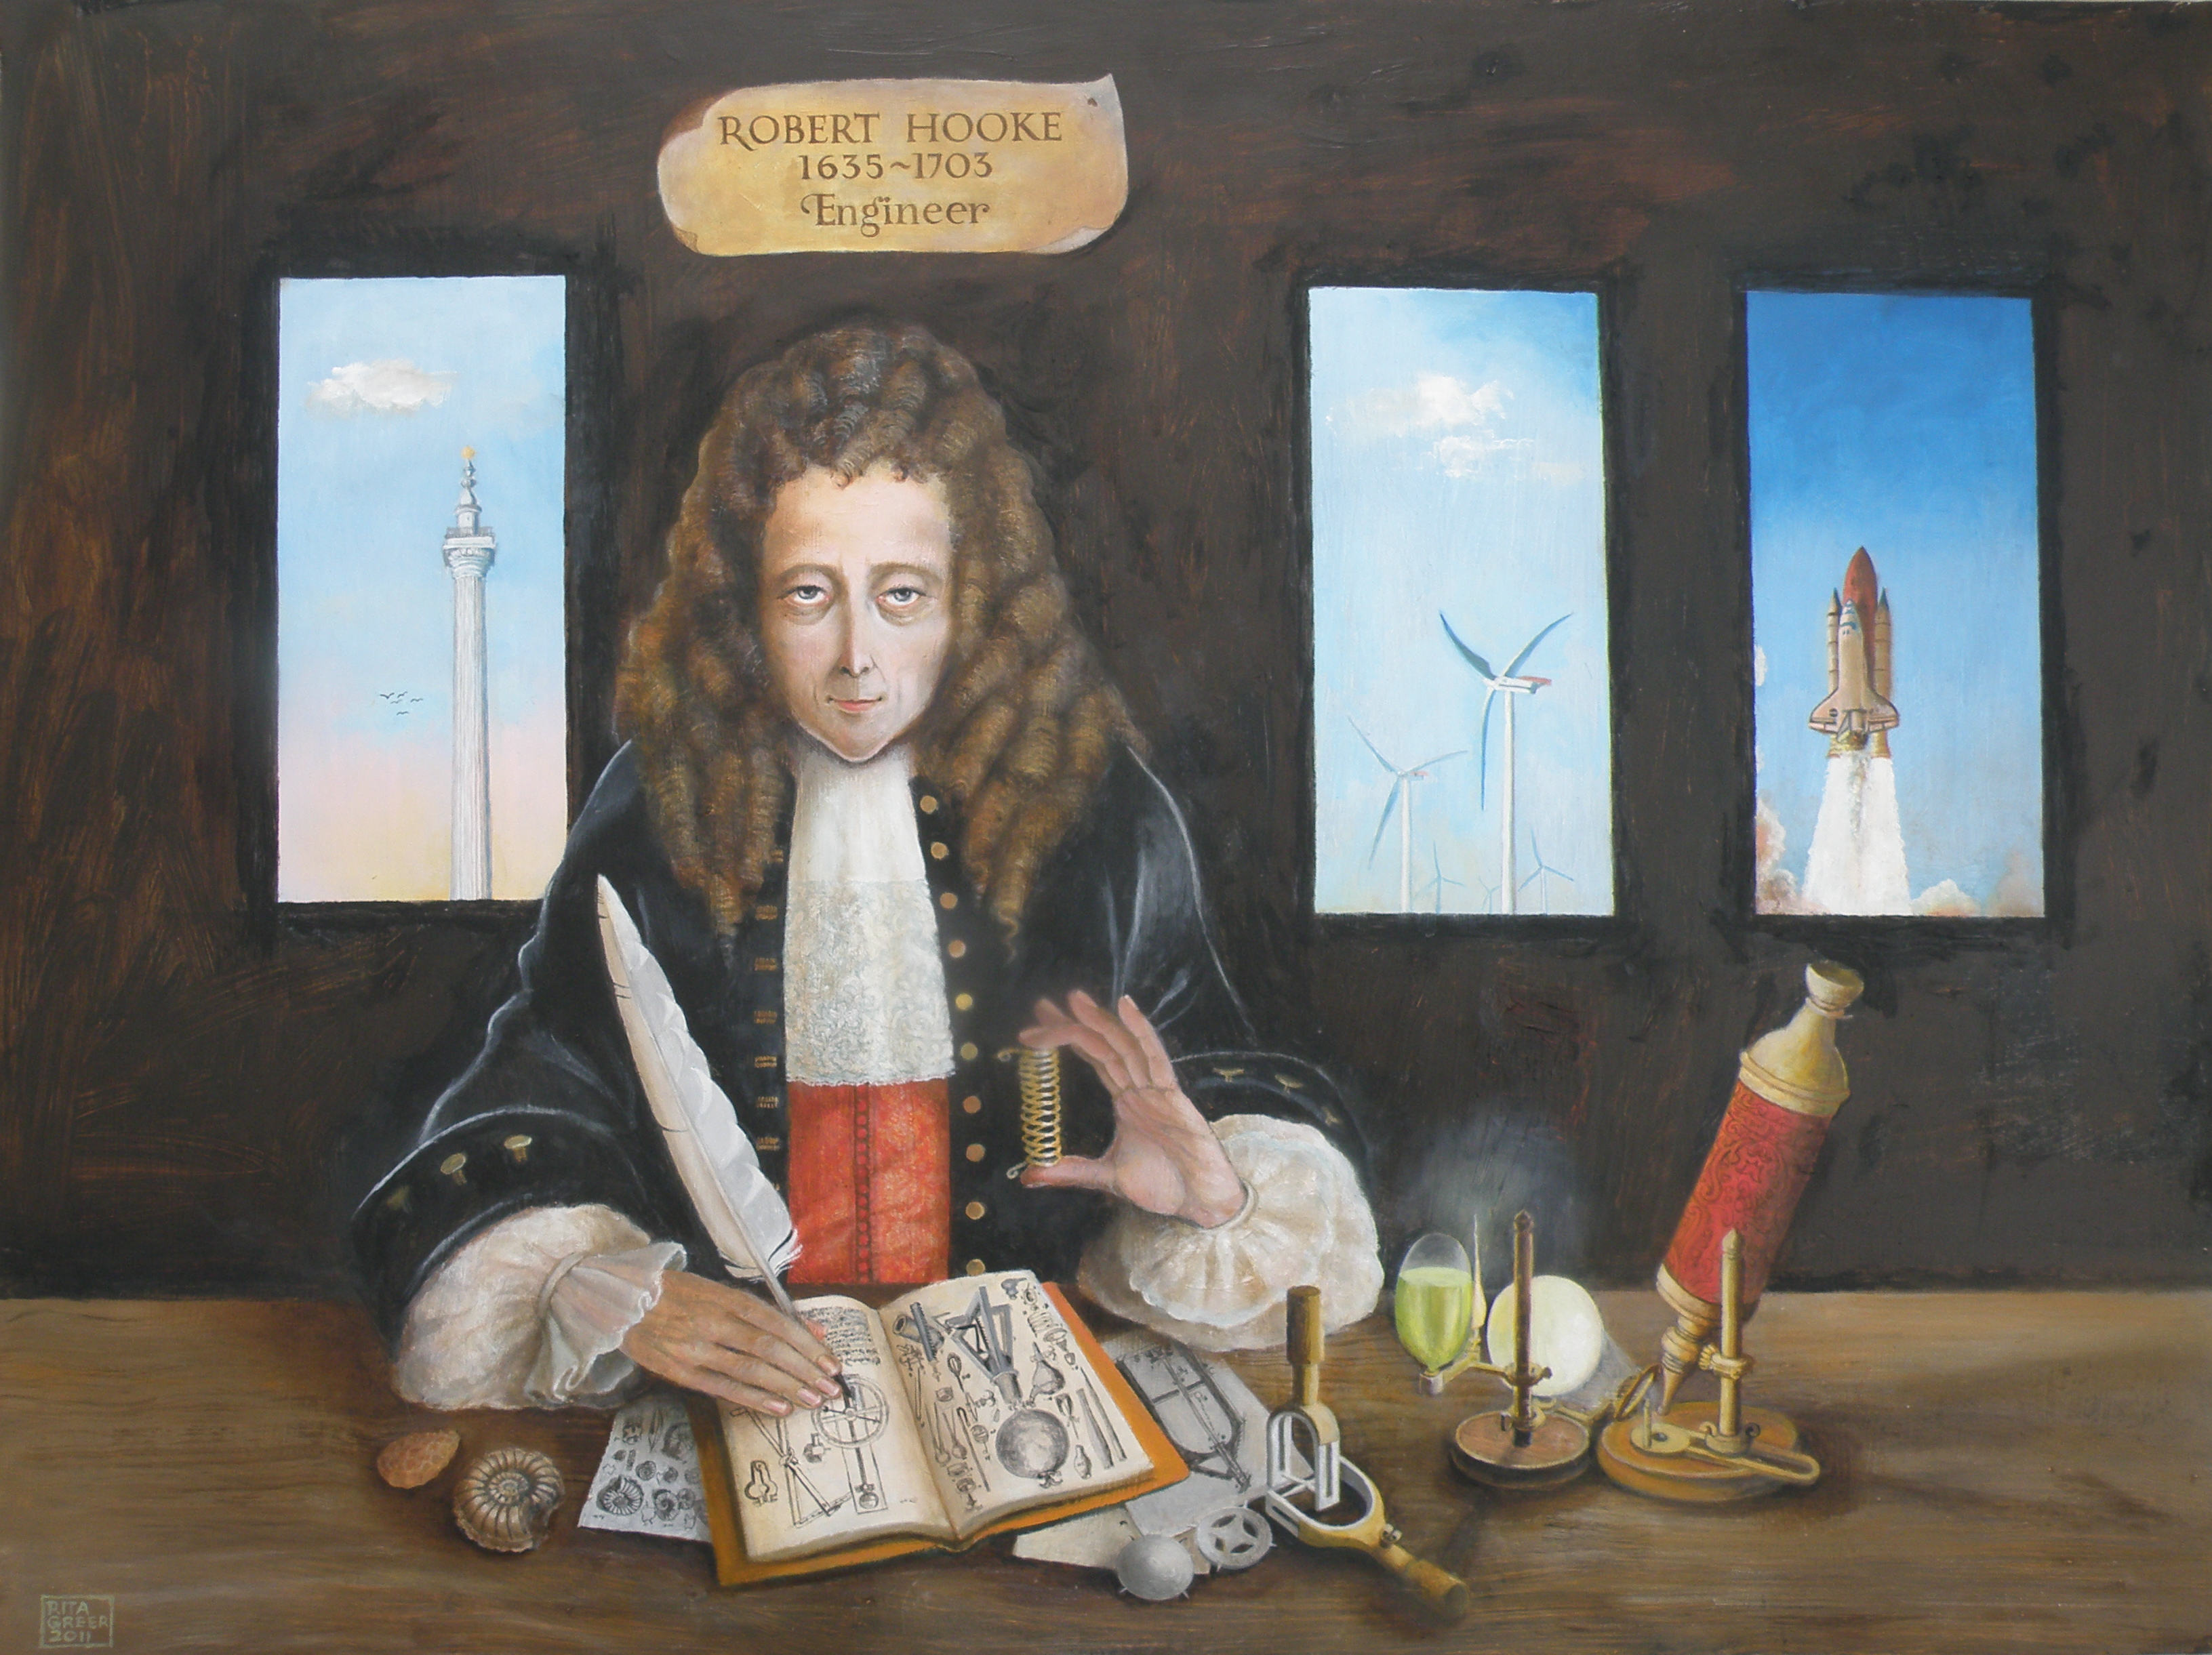 File:Robert Hooke 1635-1703 Engineer.jpg - Wikimedia Commons